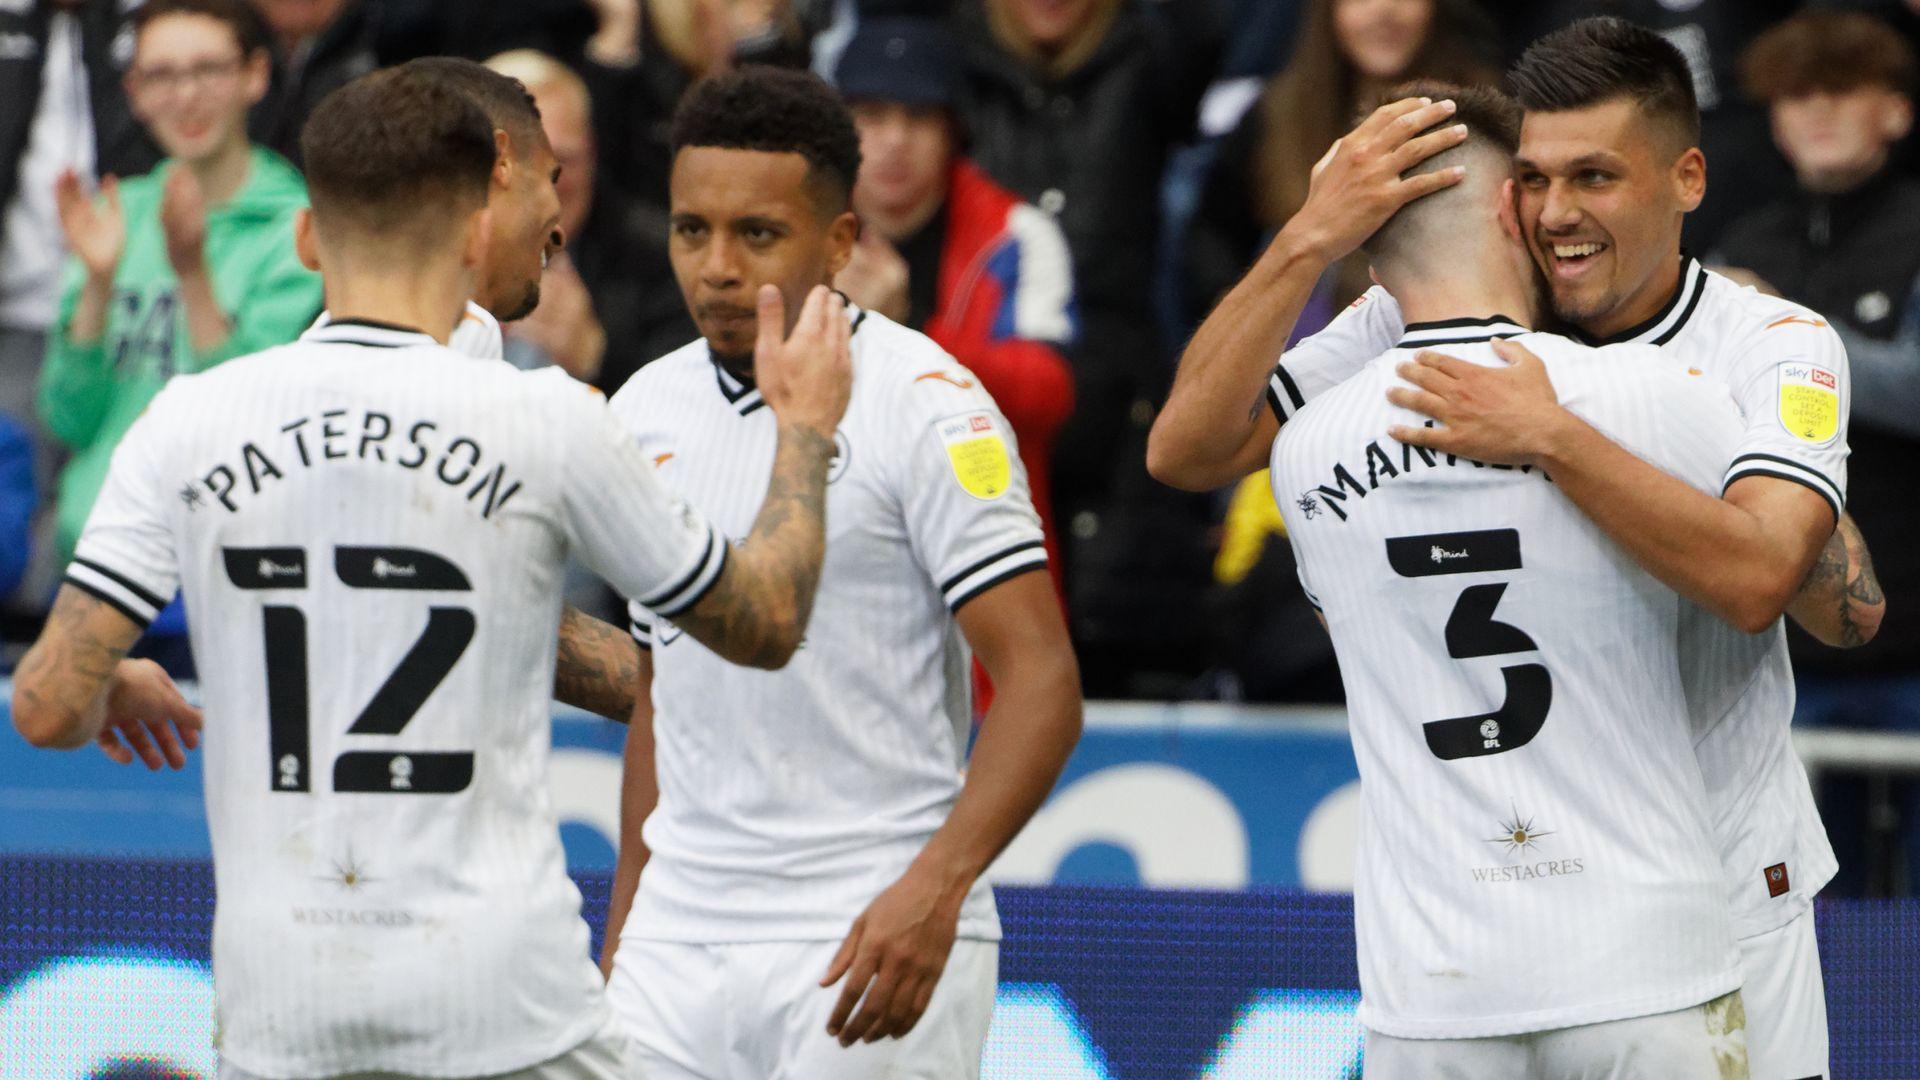 Swansea 3-0 Cardiff highlights